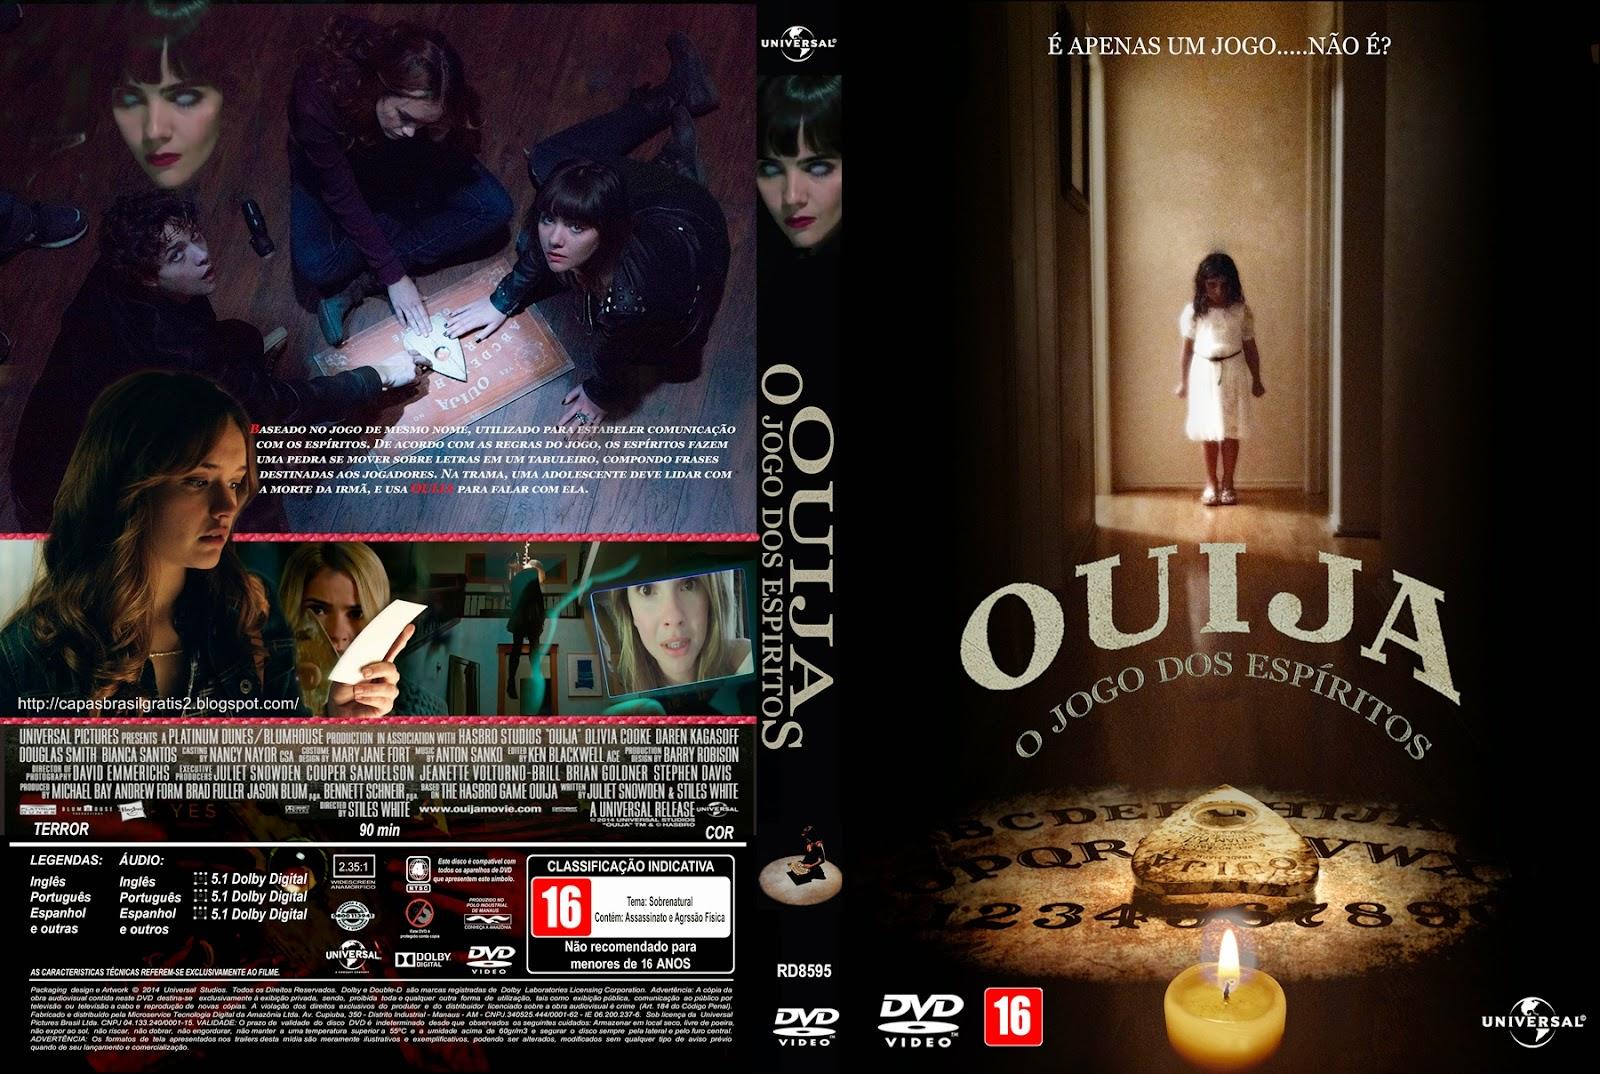 Baixar Ouija O Jogo dos Espíritos BDRip XviD Dual Áudio Ouija 2B  2BO 2BJogo 2BDos 2BEsp C3 ADritos